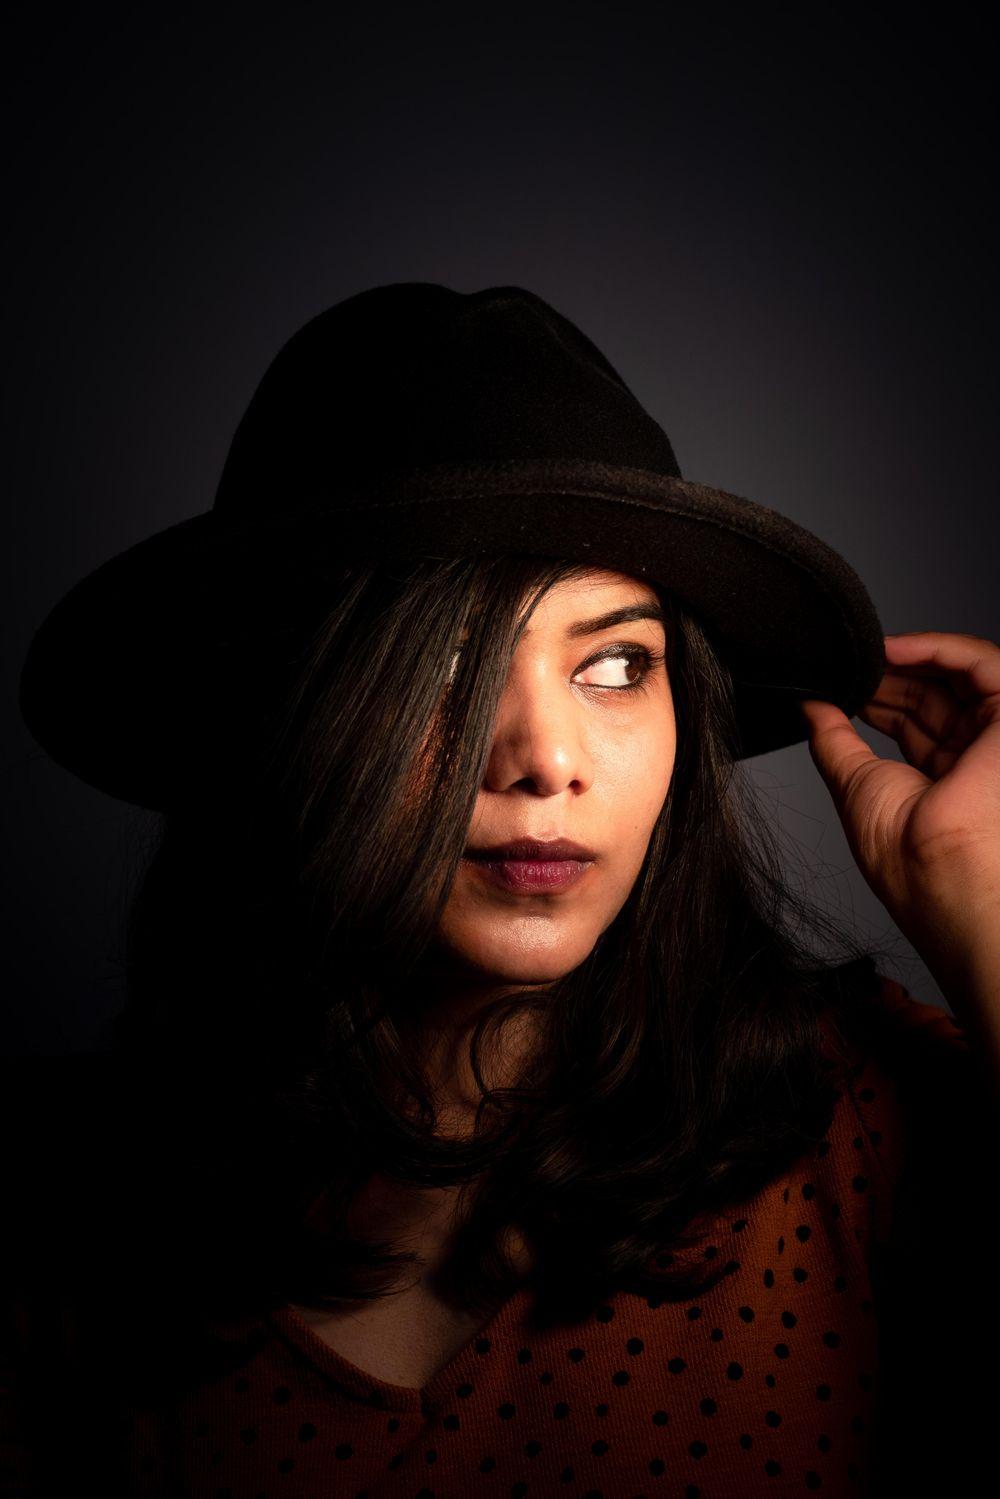 Self Portraiture - image 1 - student project